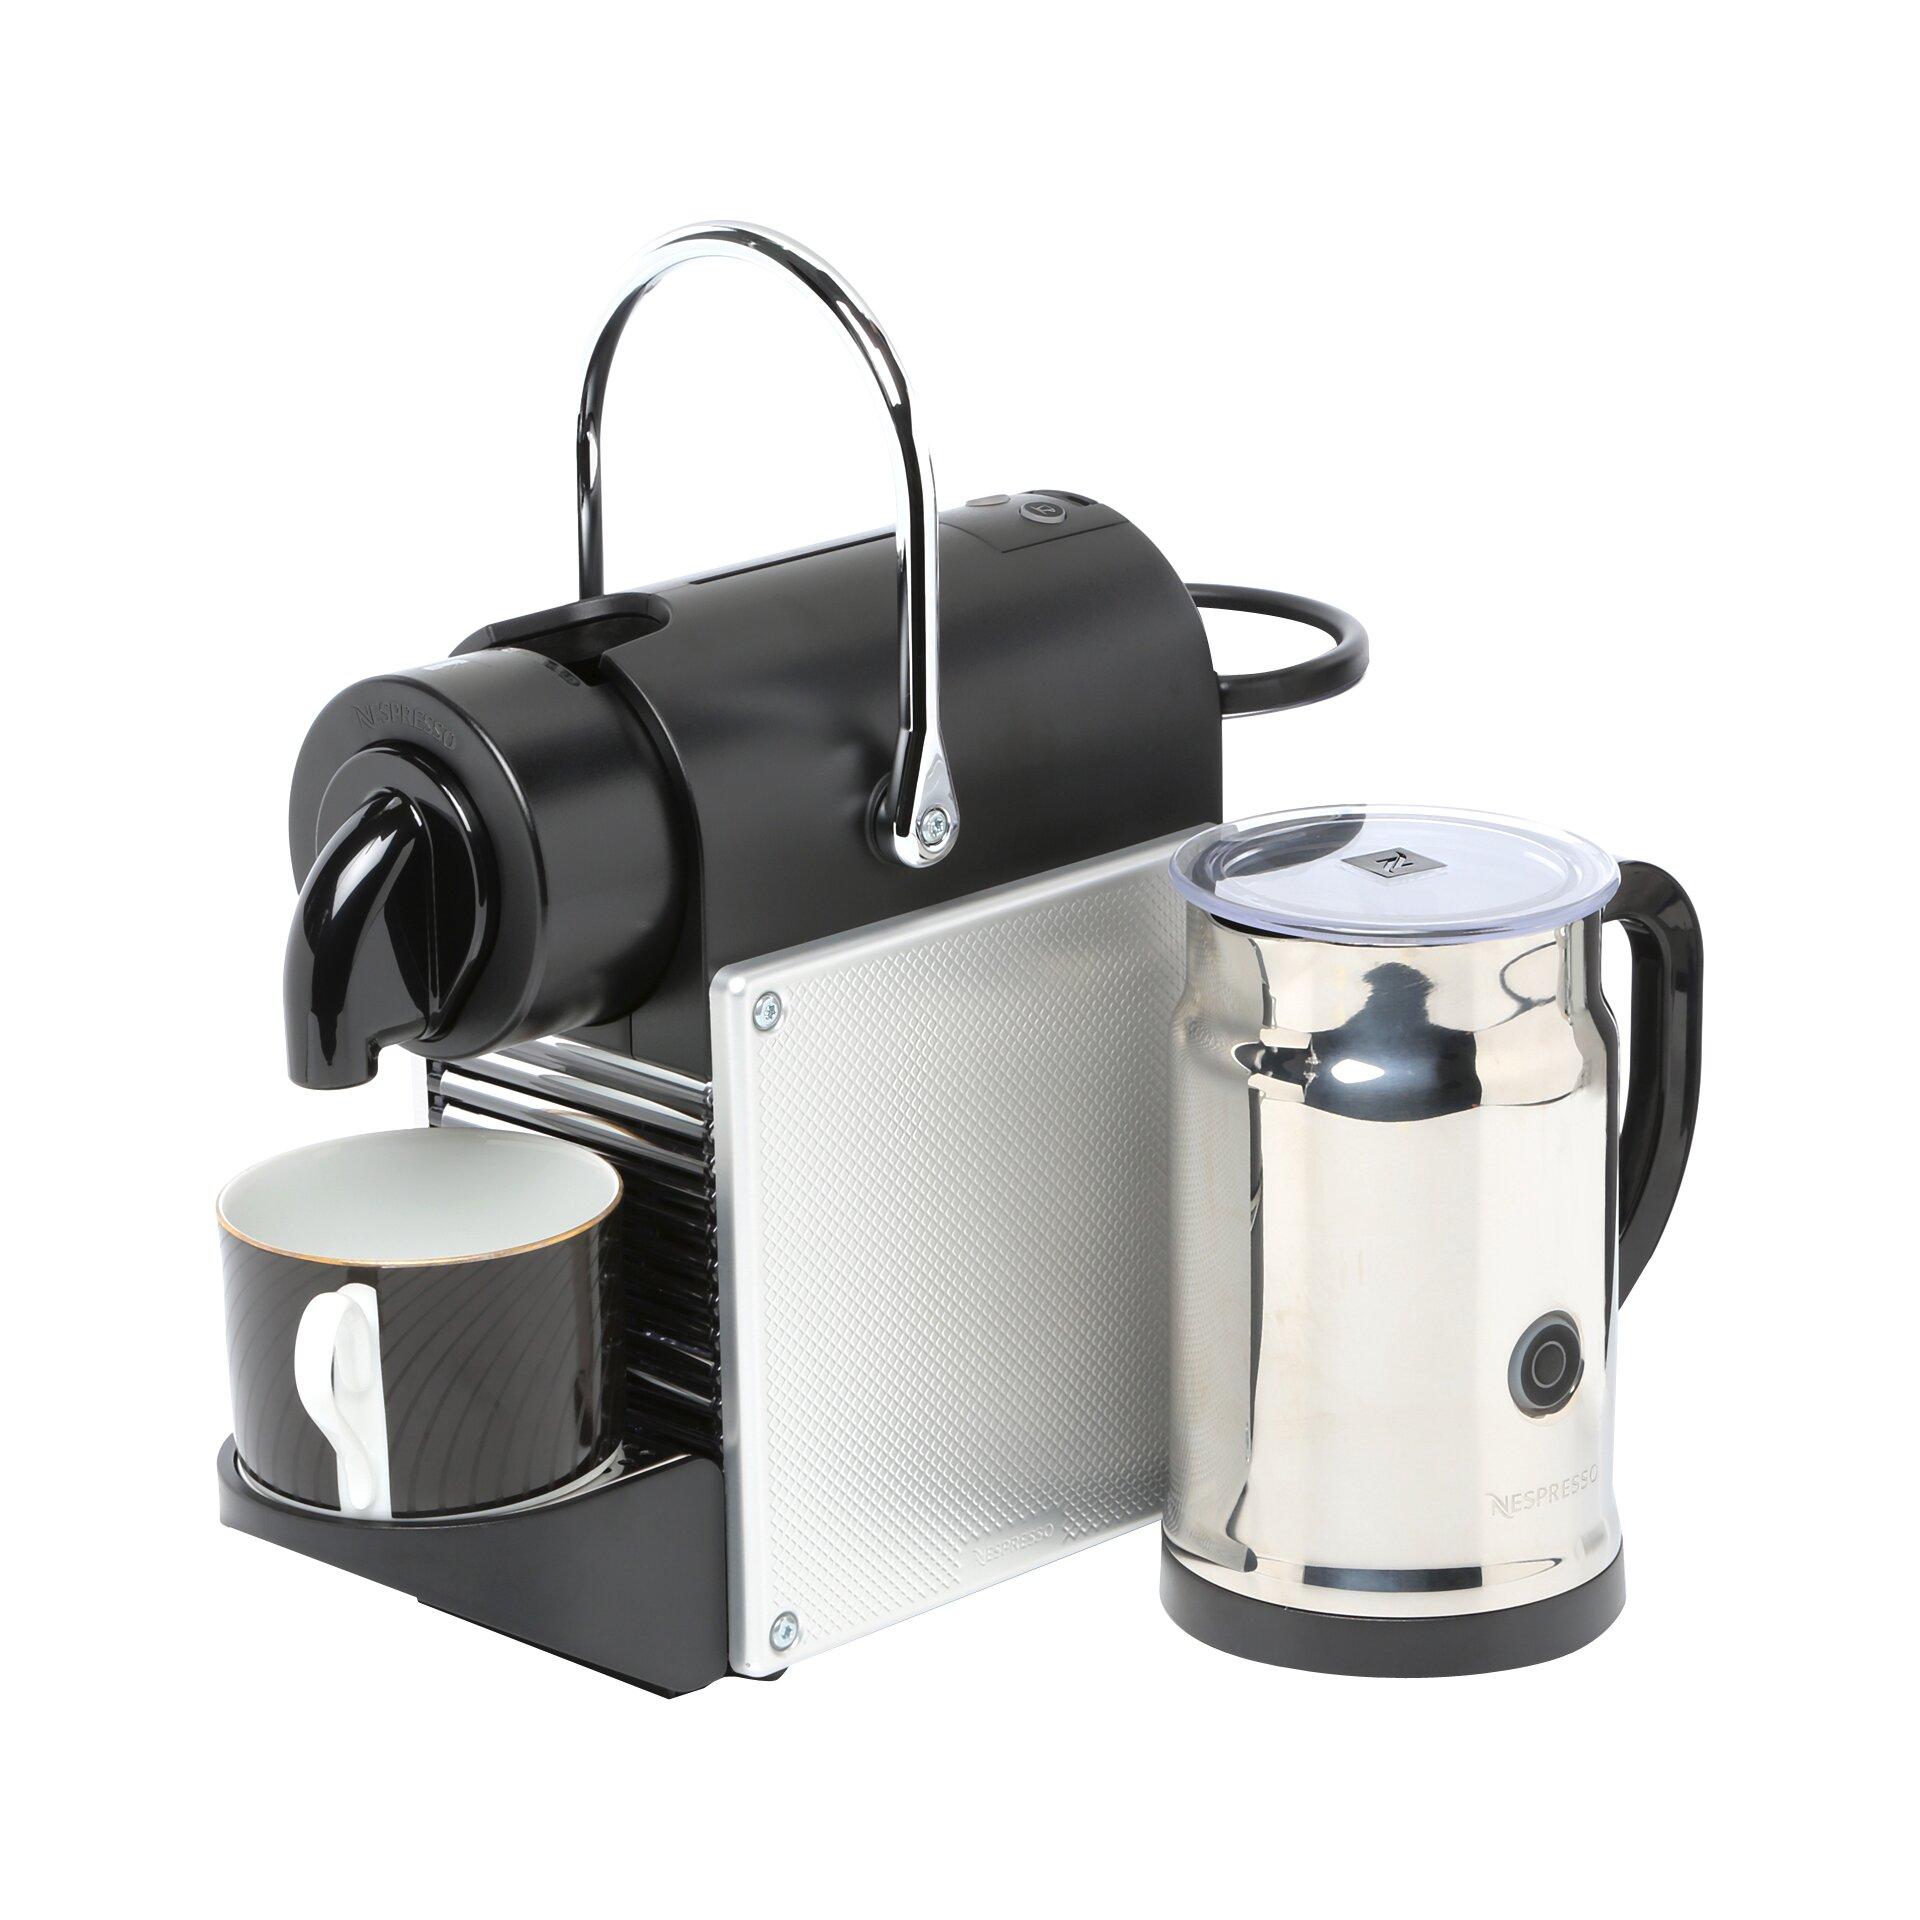 nespresso machine with milk frother